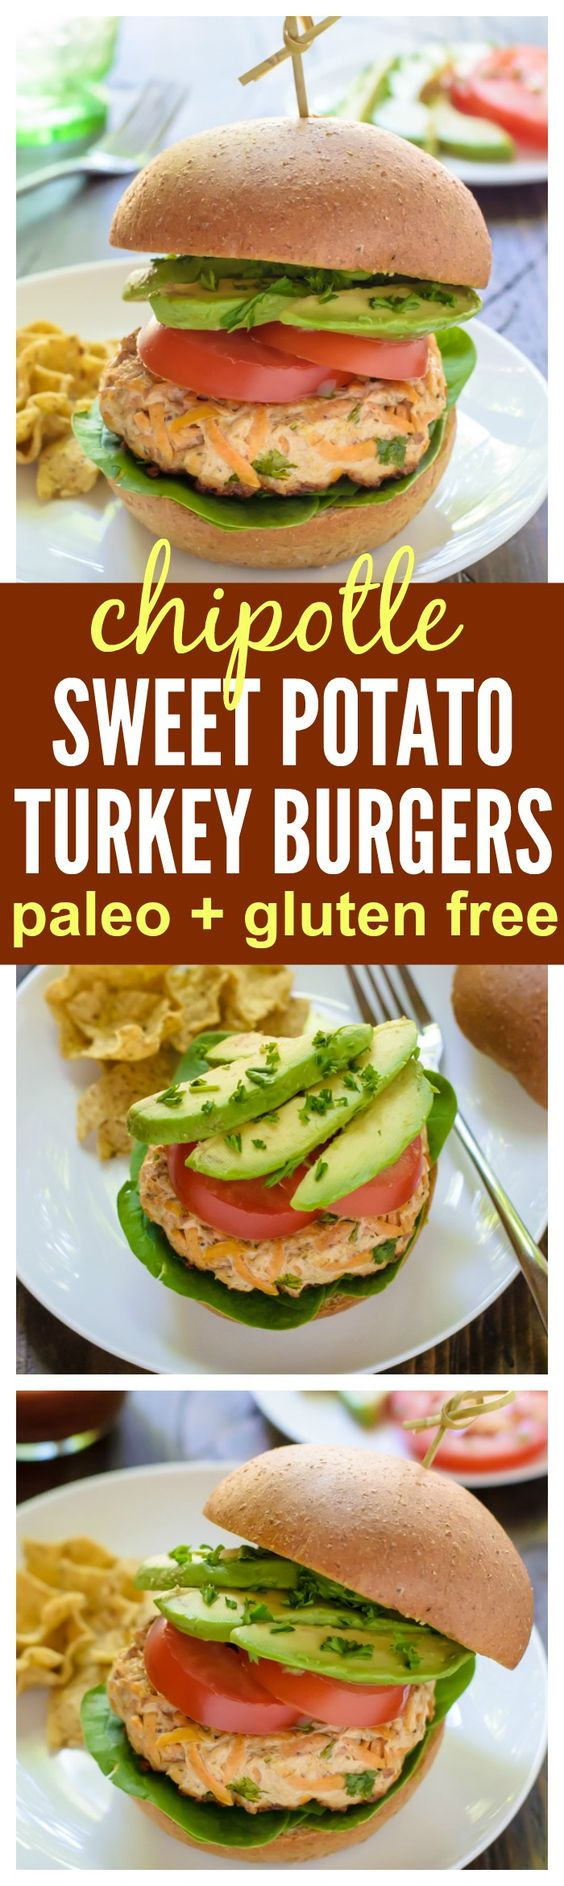 healthy gluten turkey burgers gluten free foods burgers free food ...